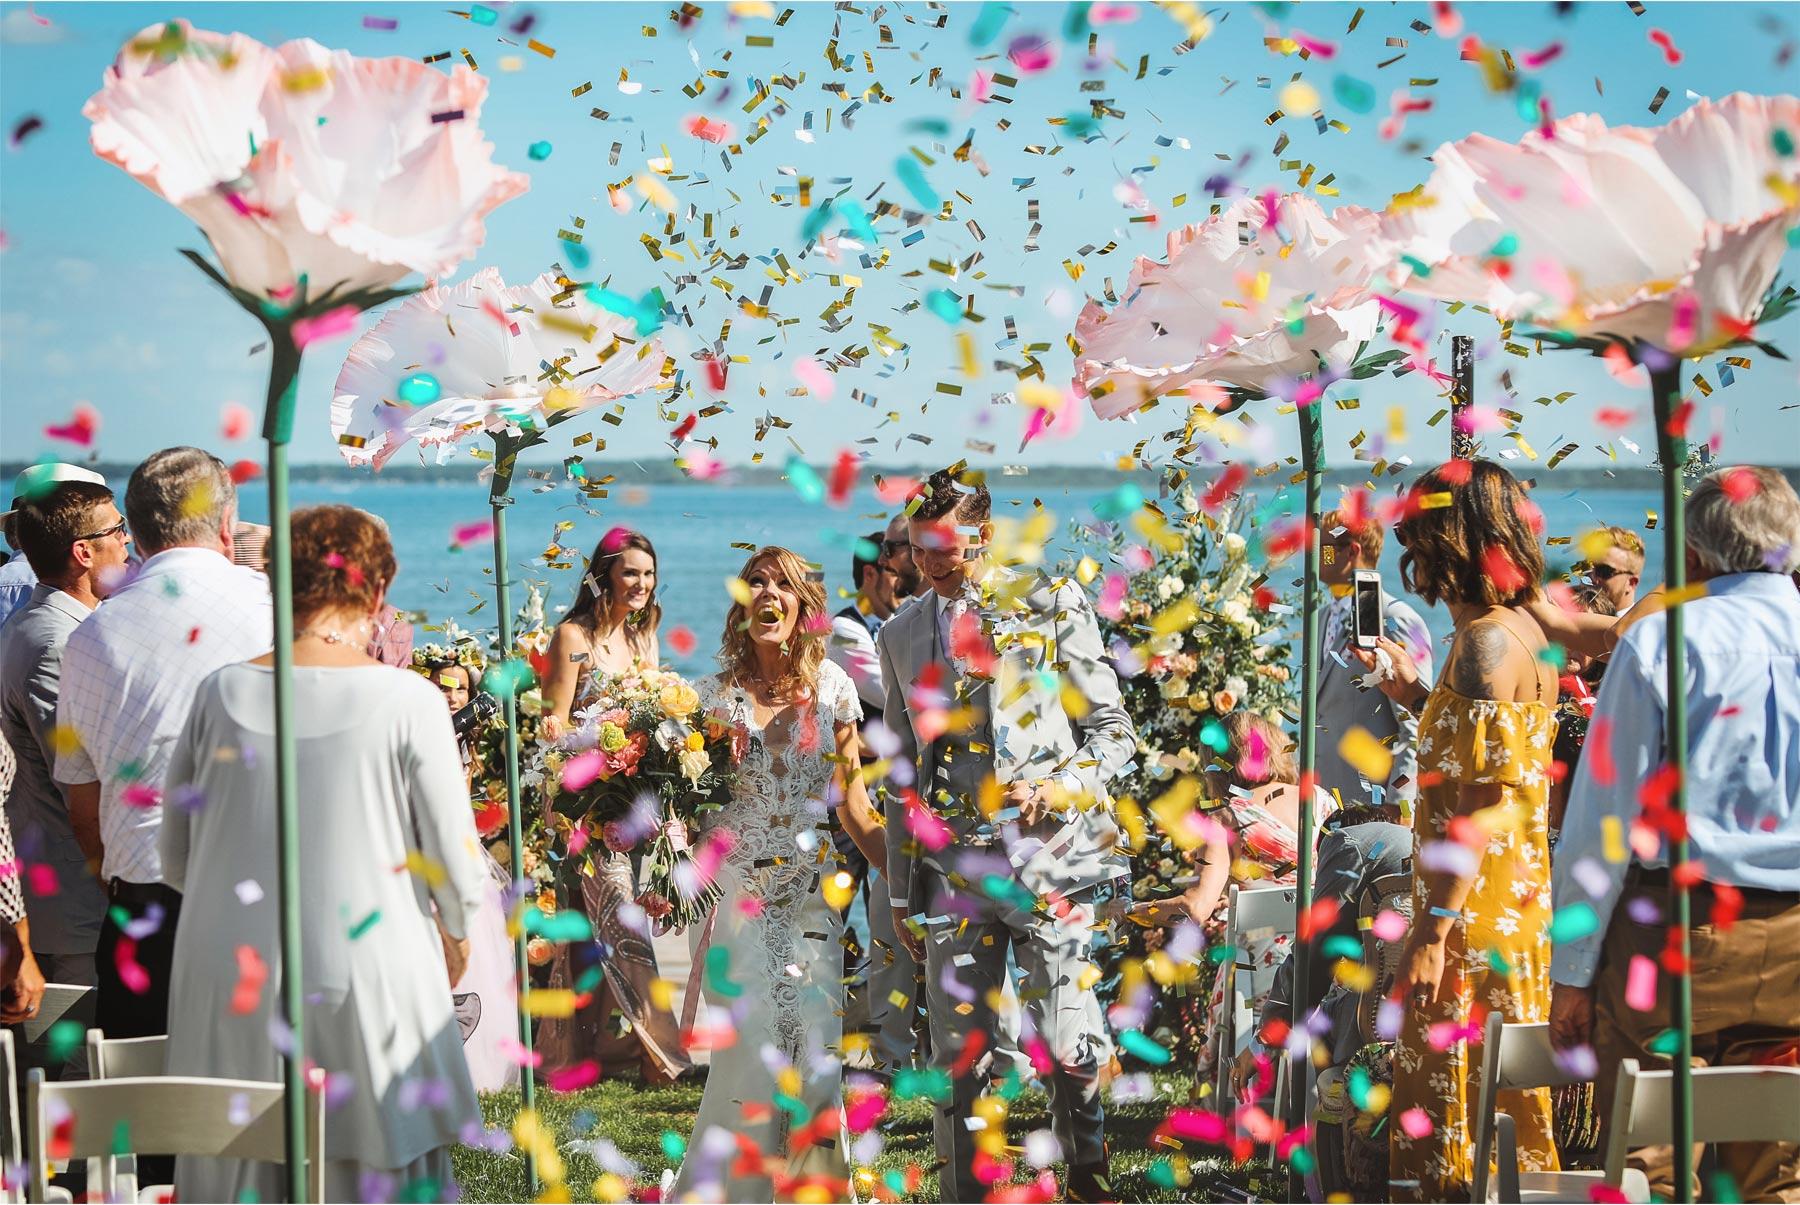 15-Vick-Photography-Wedding-Ottertail-Minnesota-Alice-in-Wonderland-Theme-Ceremony-Outdoor-Lake-Bride-Groom-Giant-Poppys-Flowers-Confetti-Tess-and-Greg.jpg